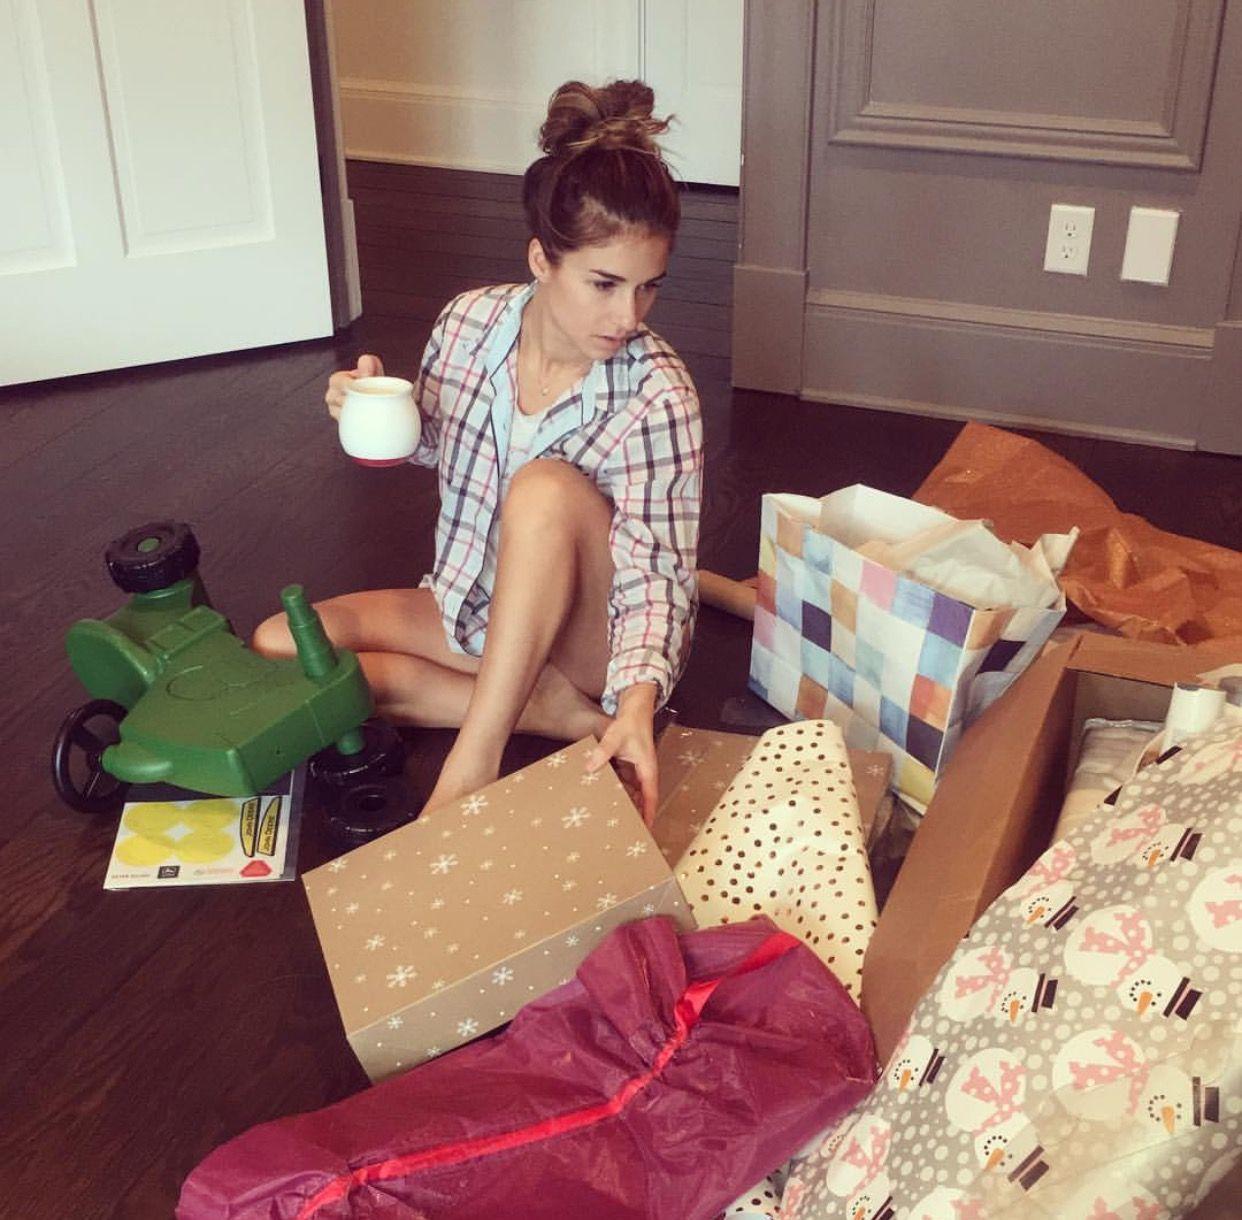 Christmas | Christmas | Pinterest | Jessie james,Jessie ja Jesse ...